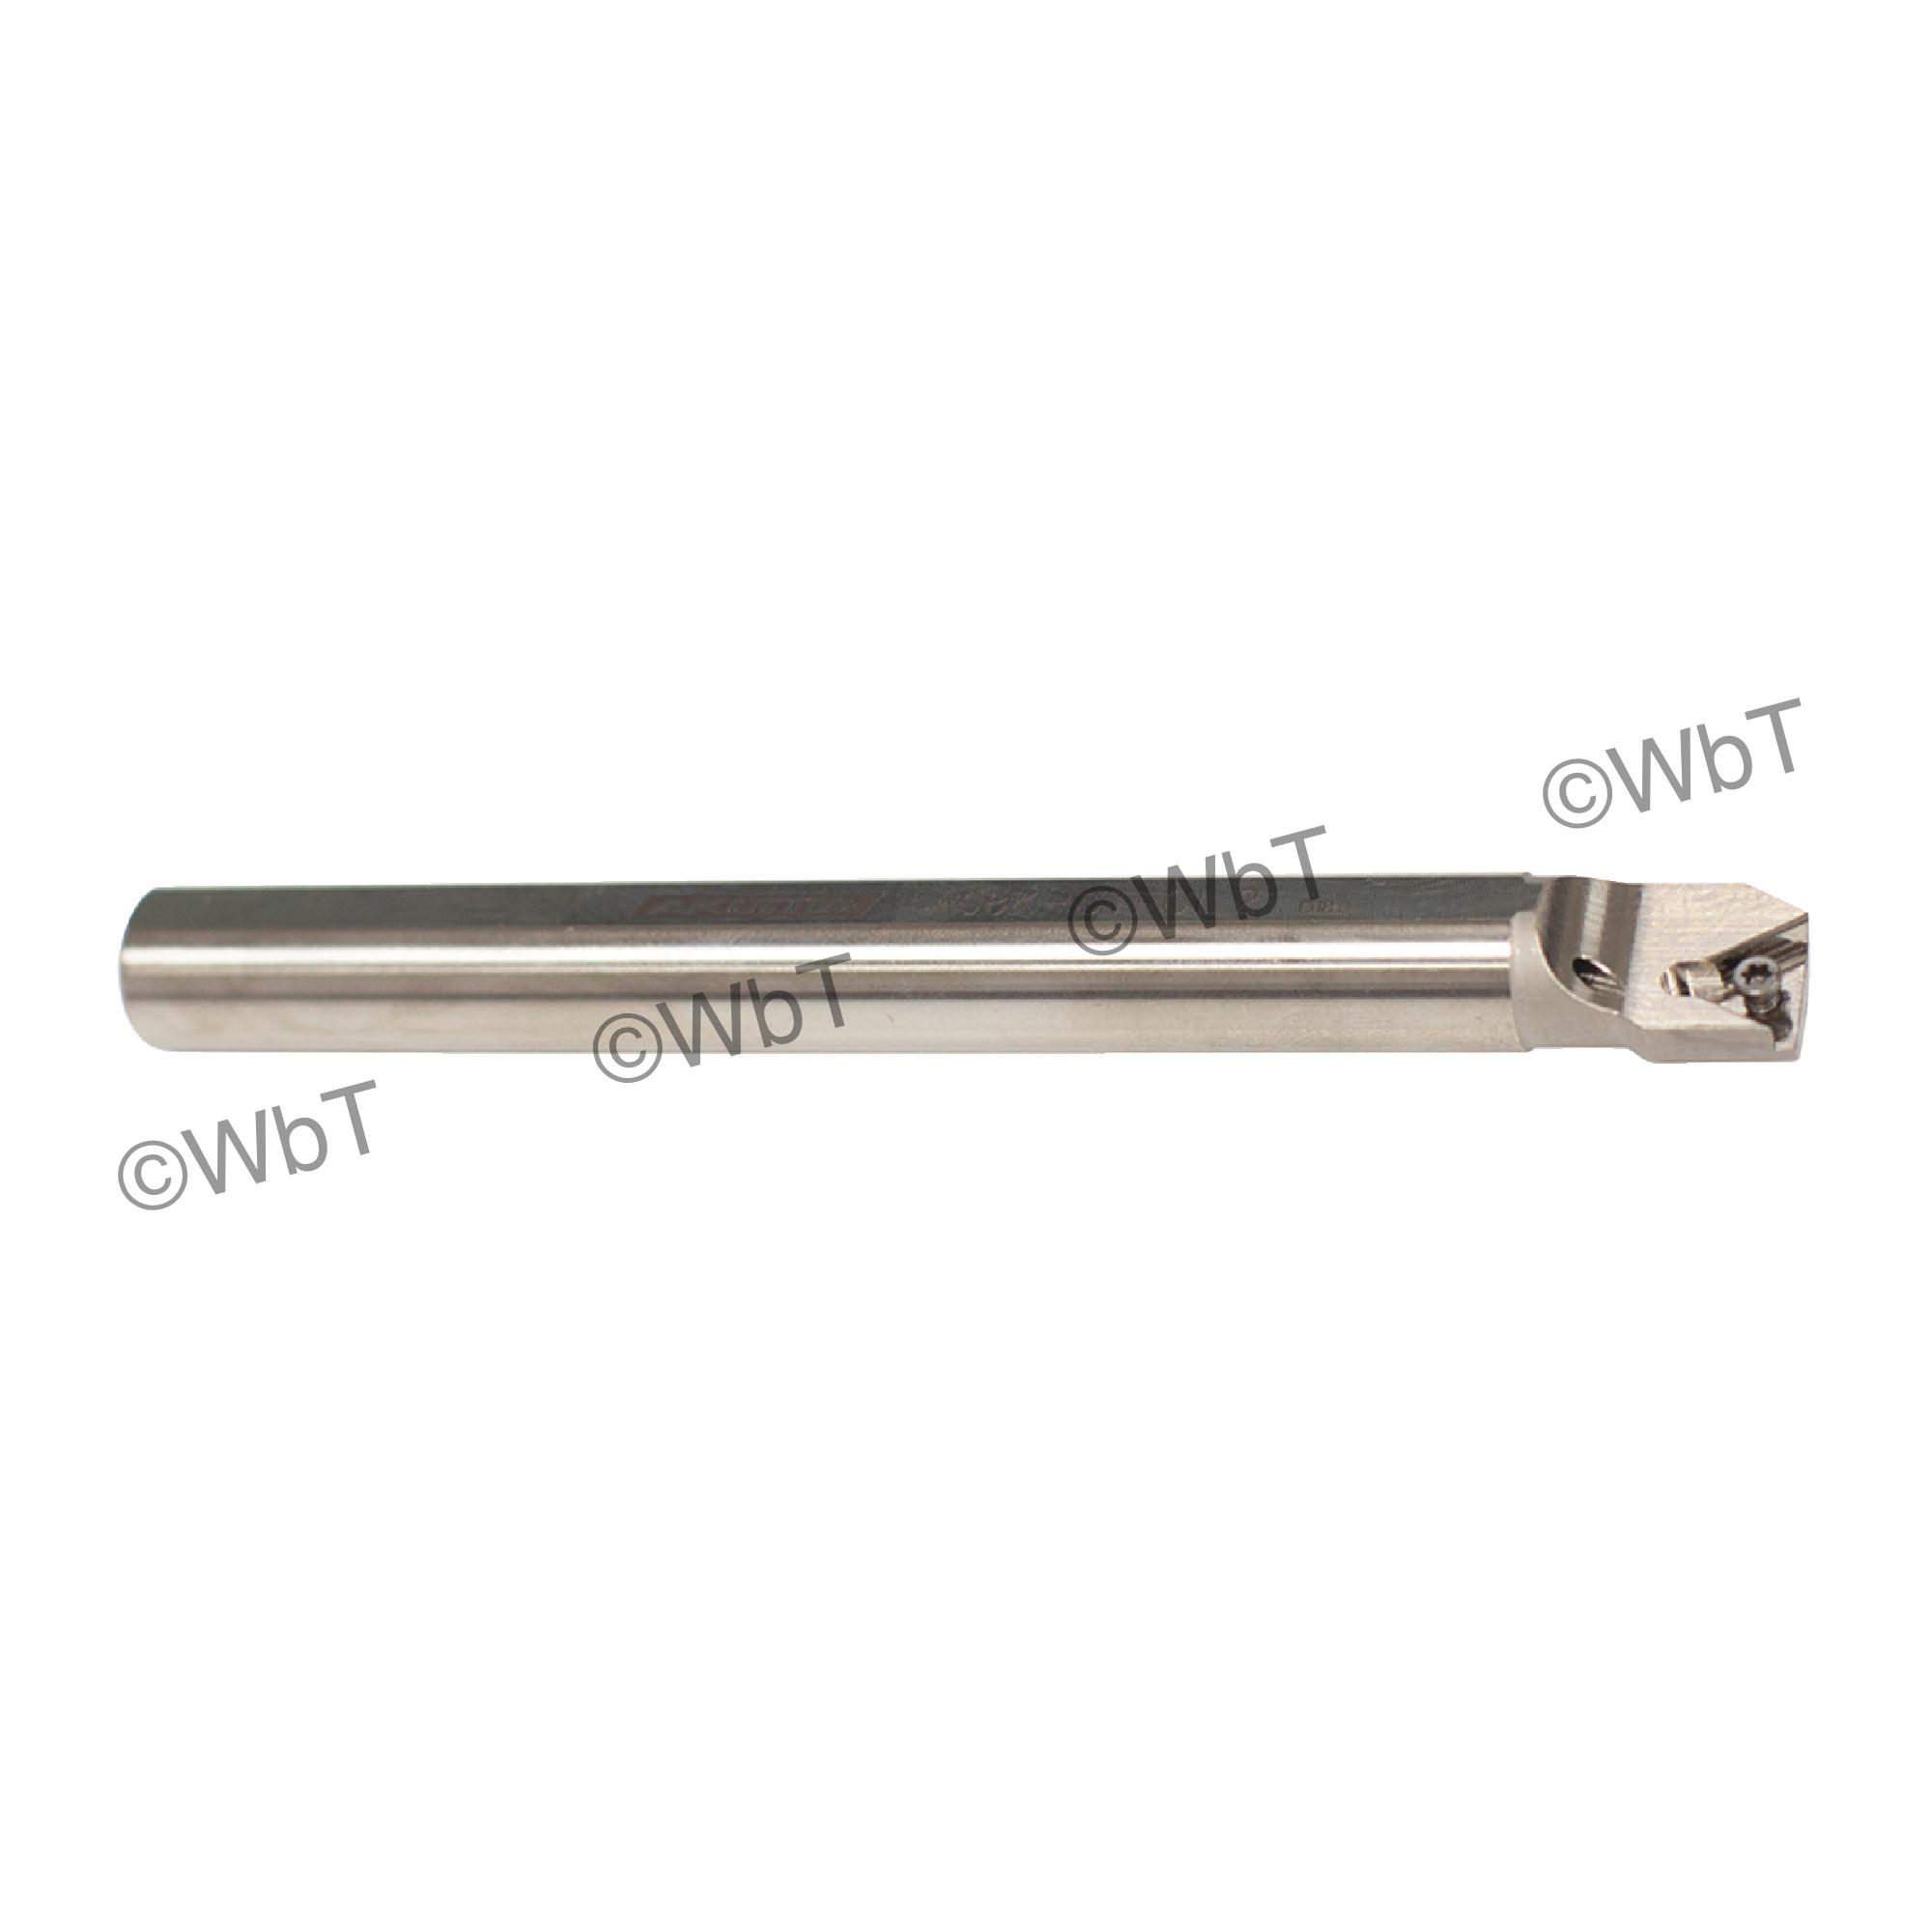 "AKUMA - A08K-STFCL-2 / Steel Boring Bar / 1/2"" Shank / TCMT2(1.5)_ / Cooalnt Thru / Left Hand"